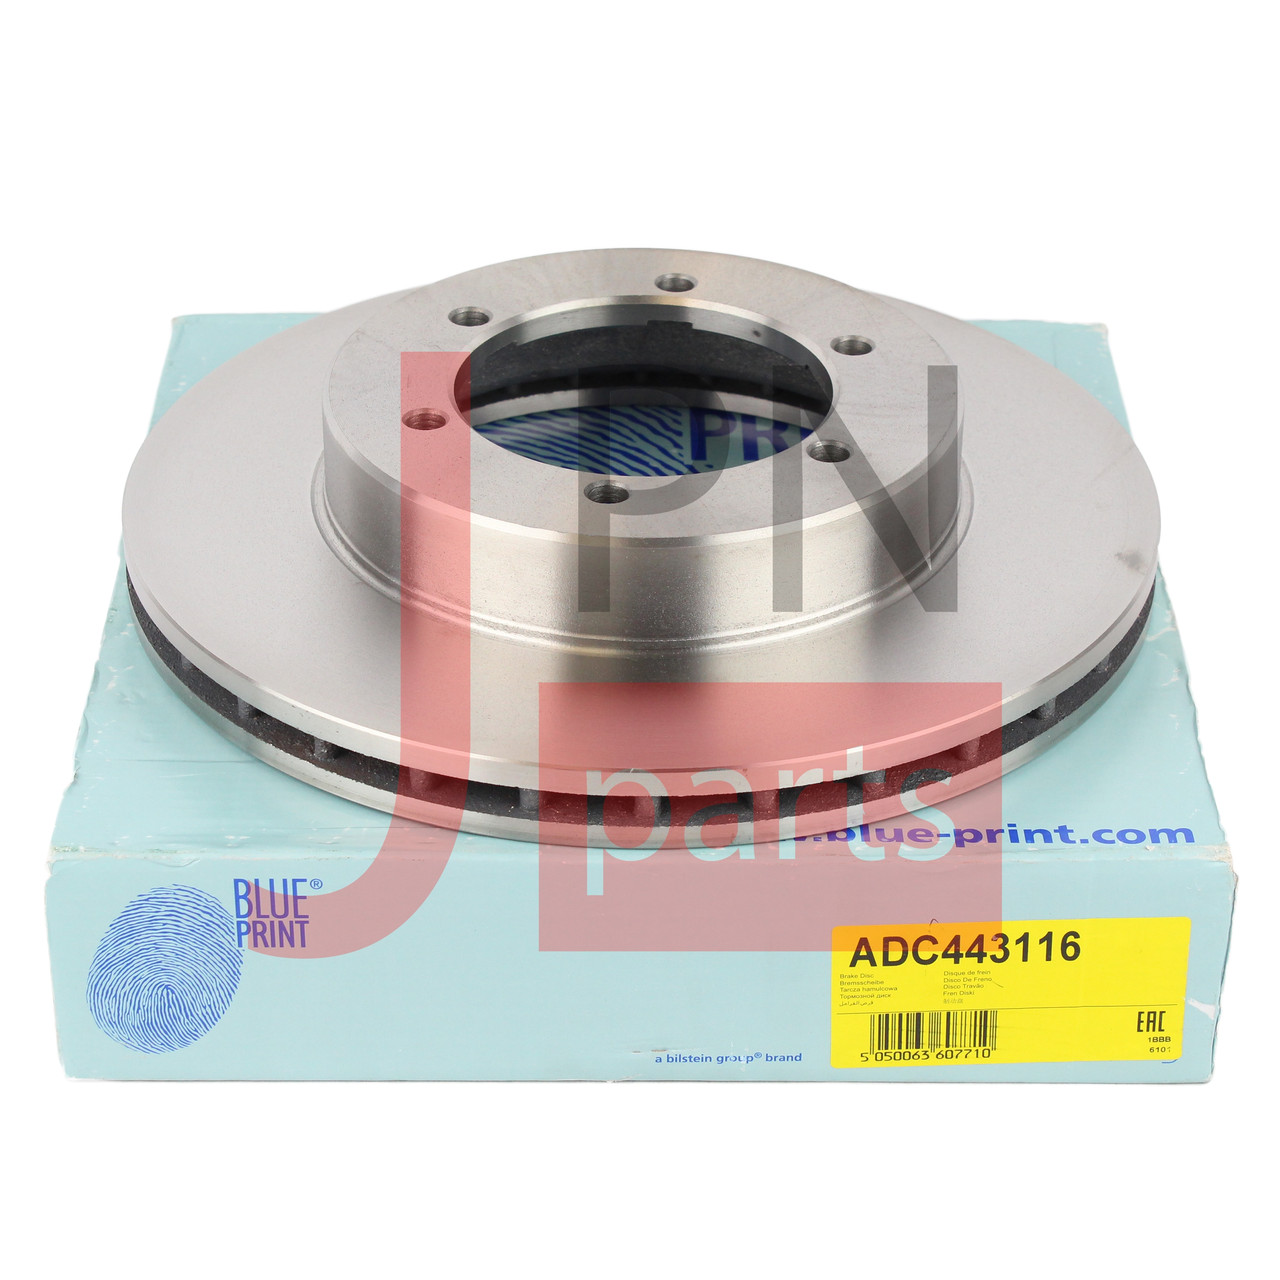 Диск тормозной передний MITSUBISHI CANTER (MK449352) 75 BLUE PRINT